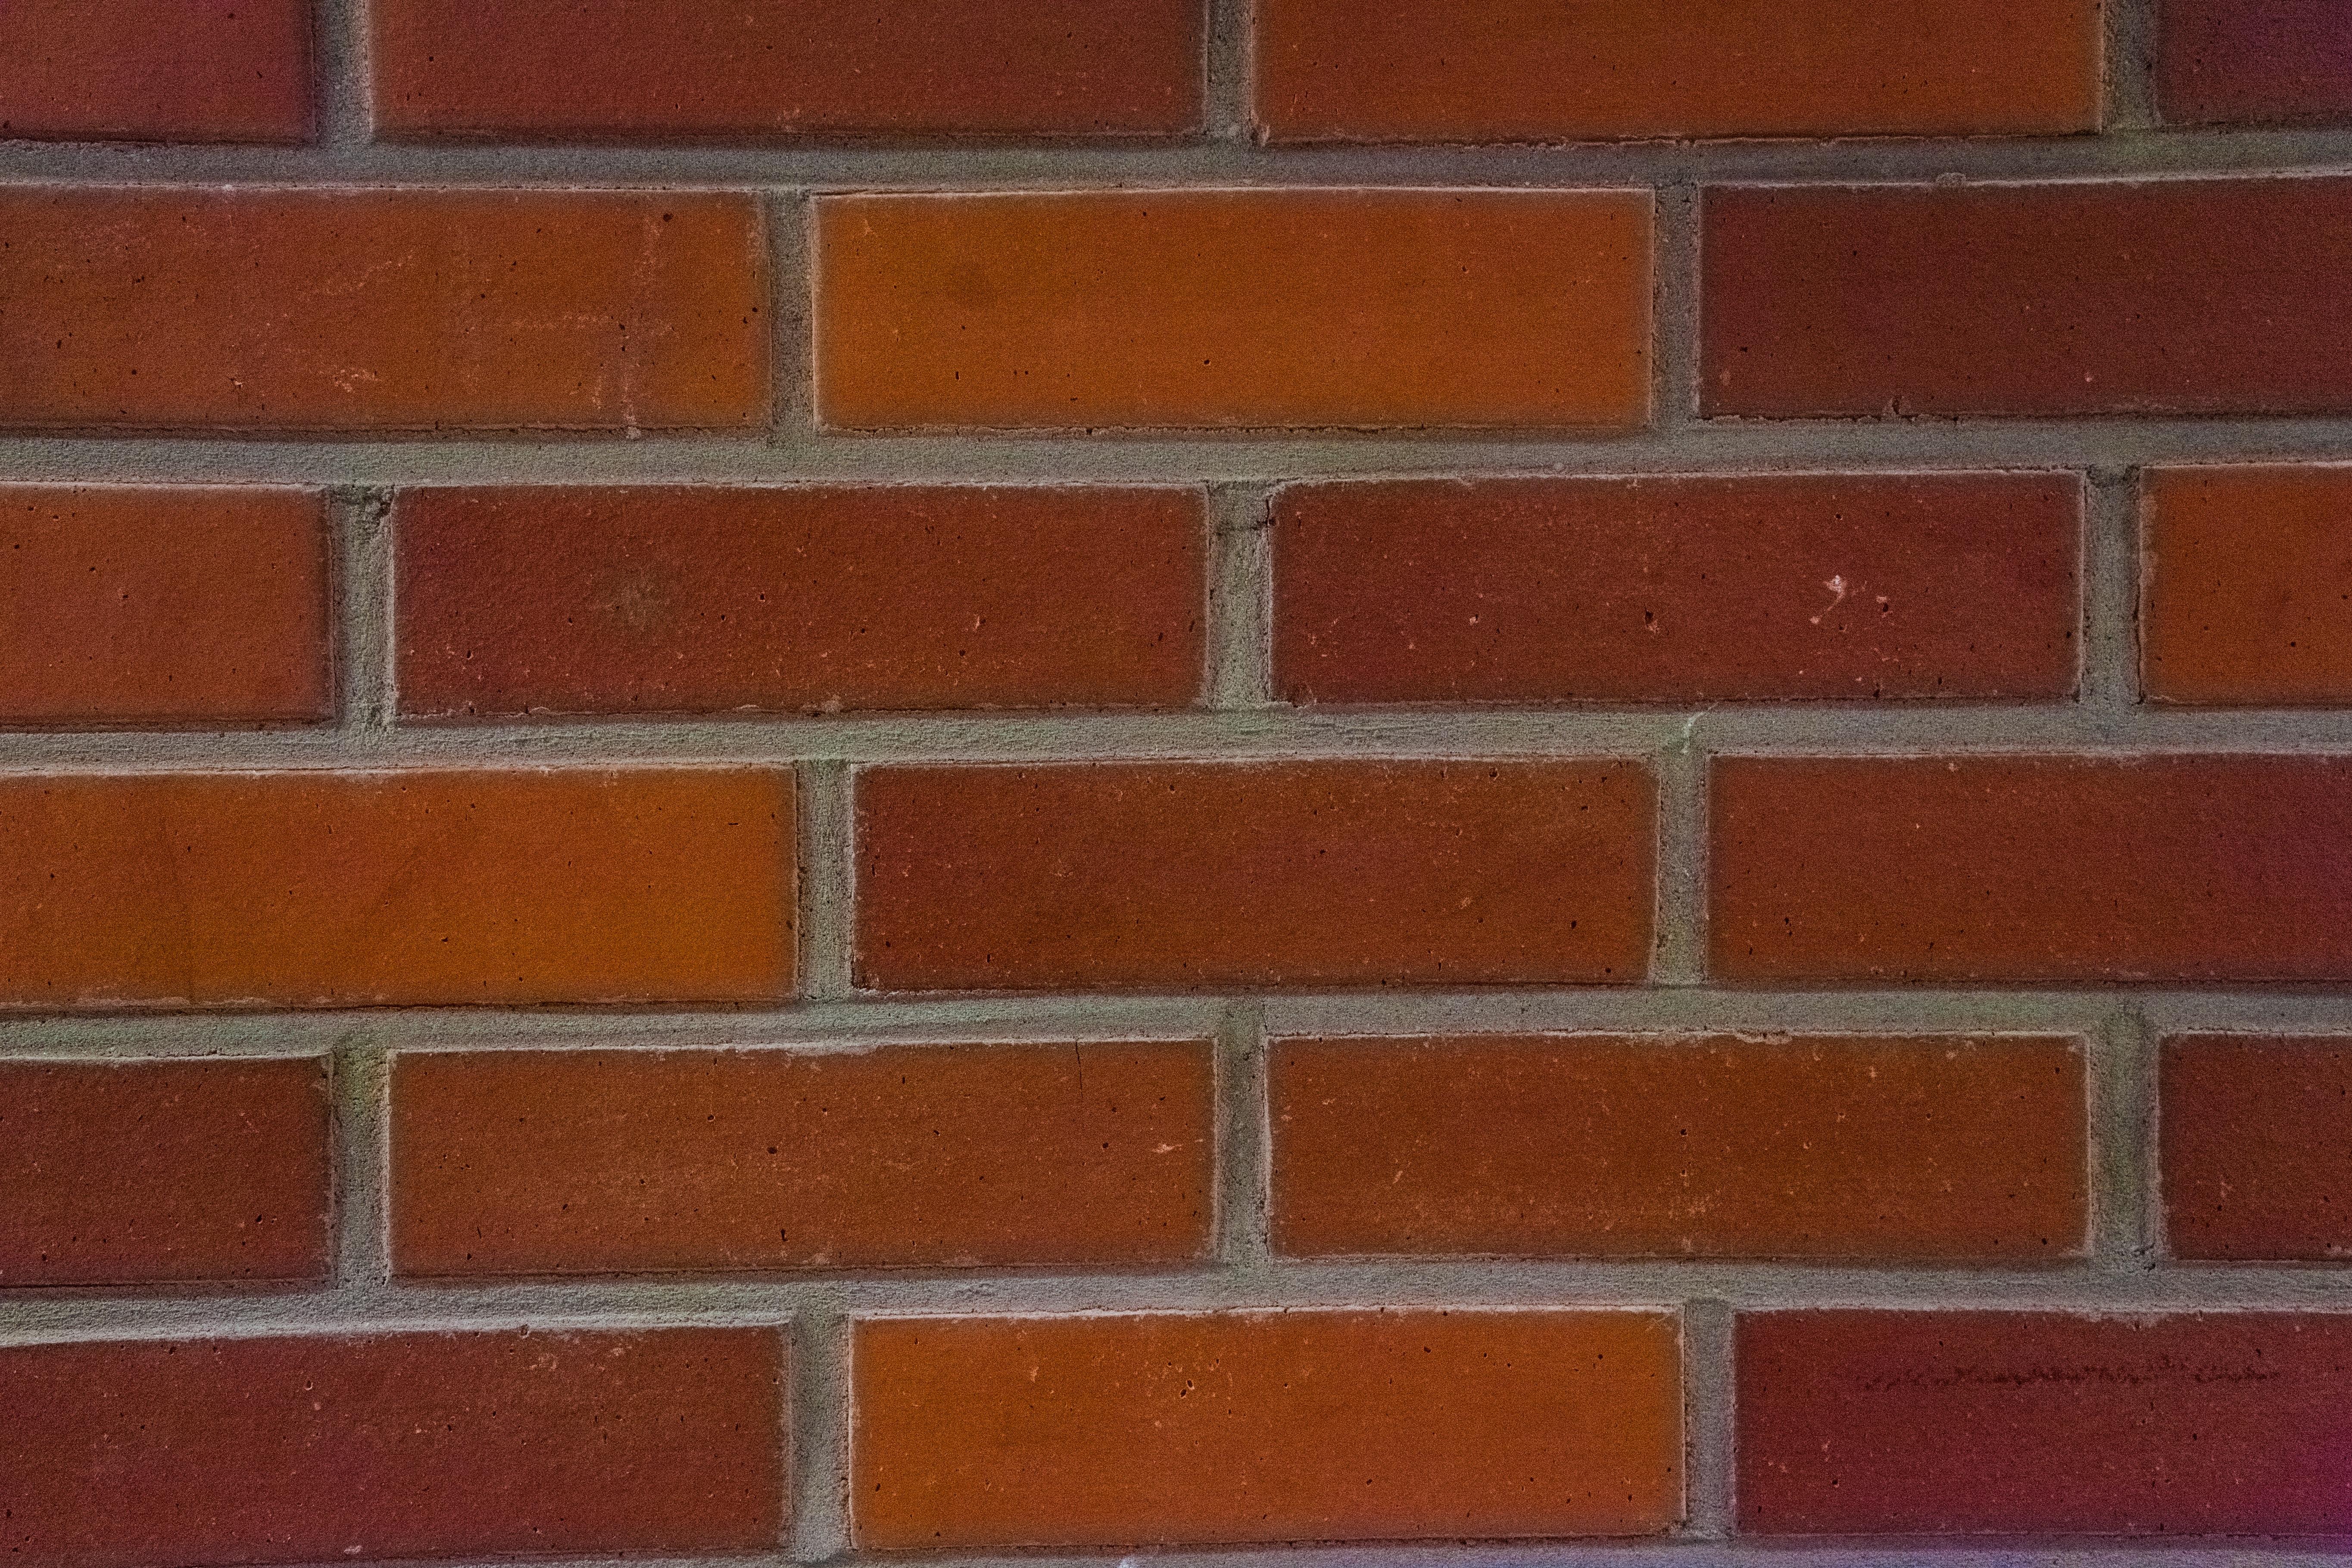 Texture Floor Building Wall Construction Pattern Red Tile Brick Close Material Lines Hardwood Bricks